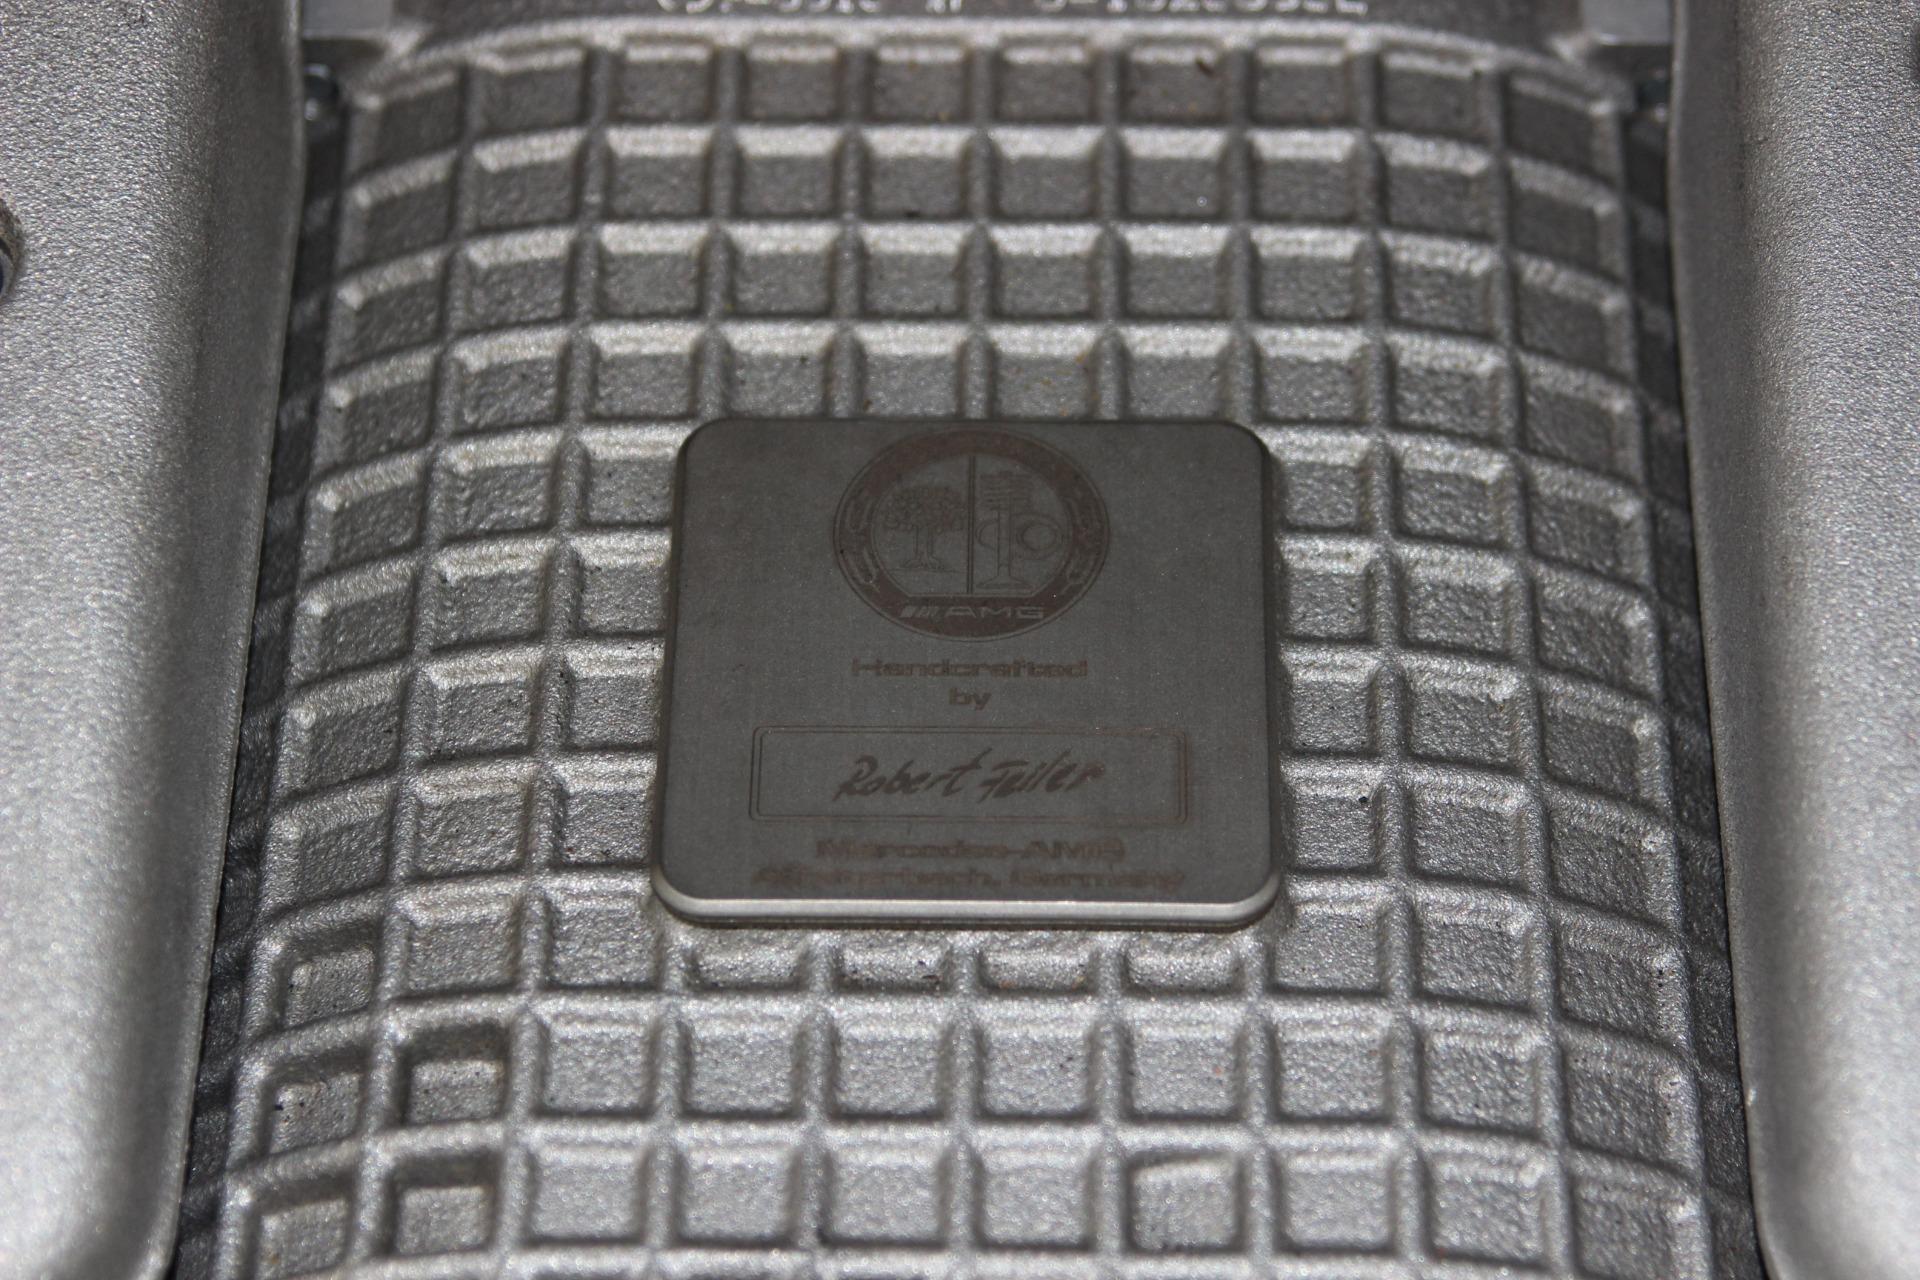 2005-Mercedes-Benz-SL-Class-SL-55-AMG